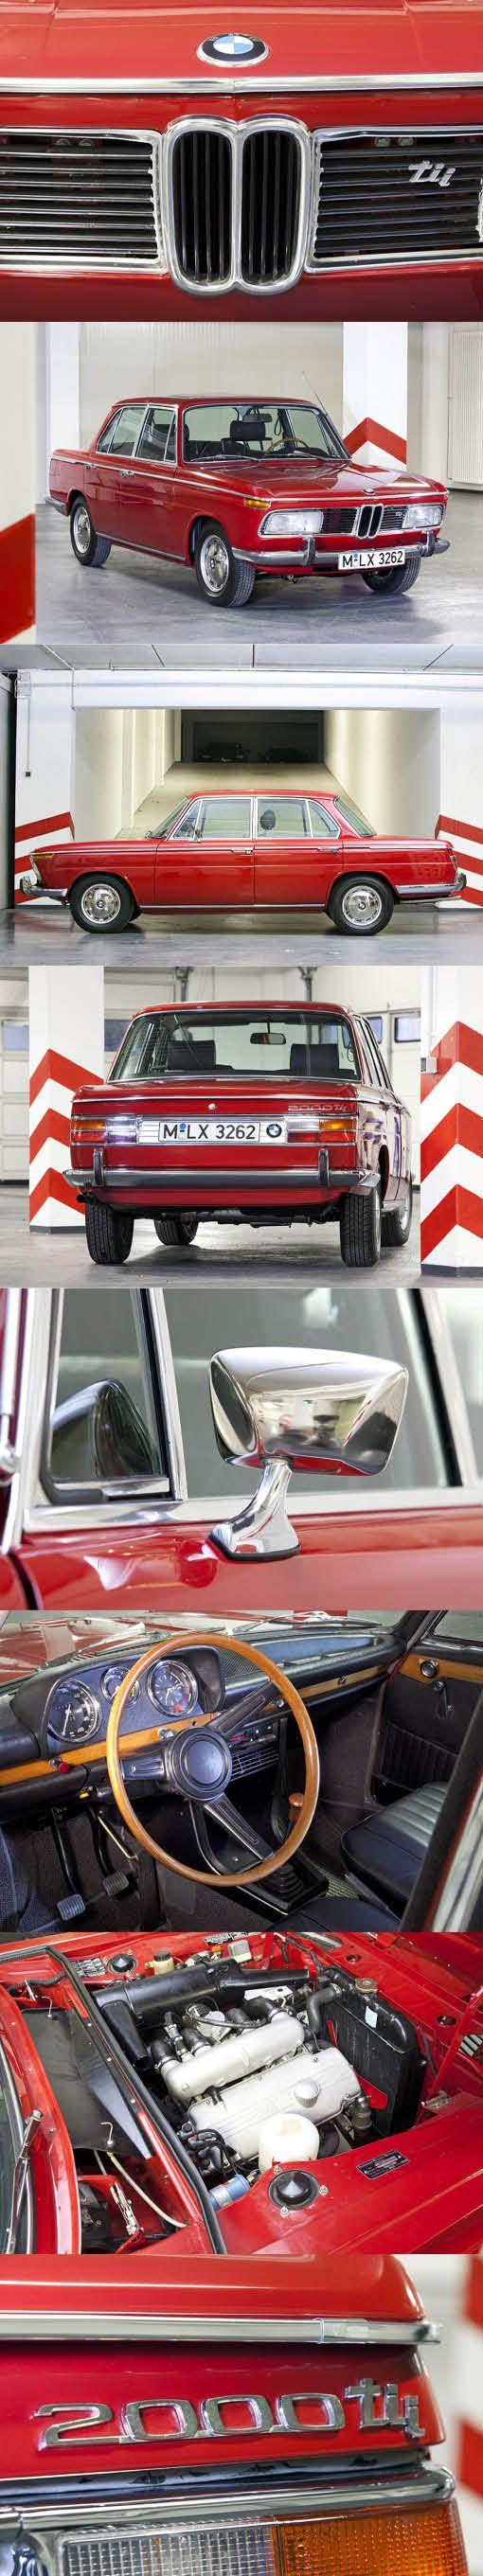 1969 BMW 2000 tii / Germany / red / 130hp / 1952pcs